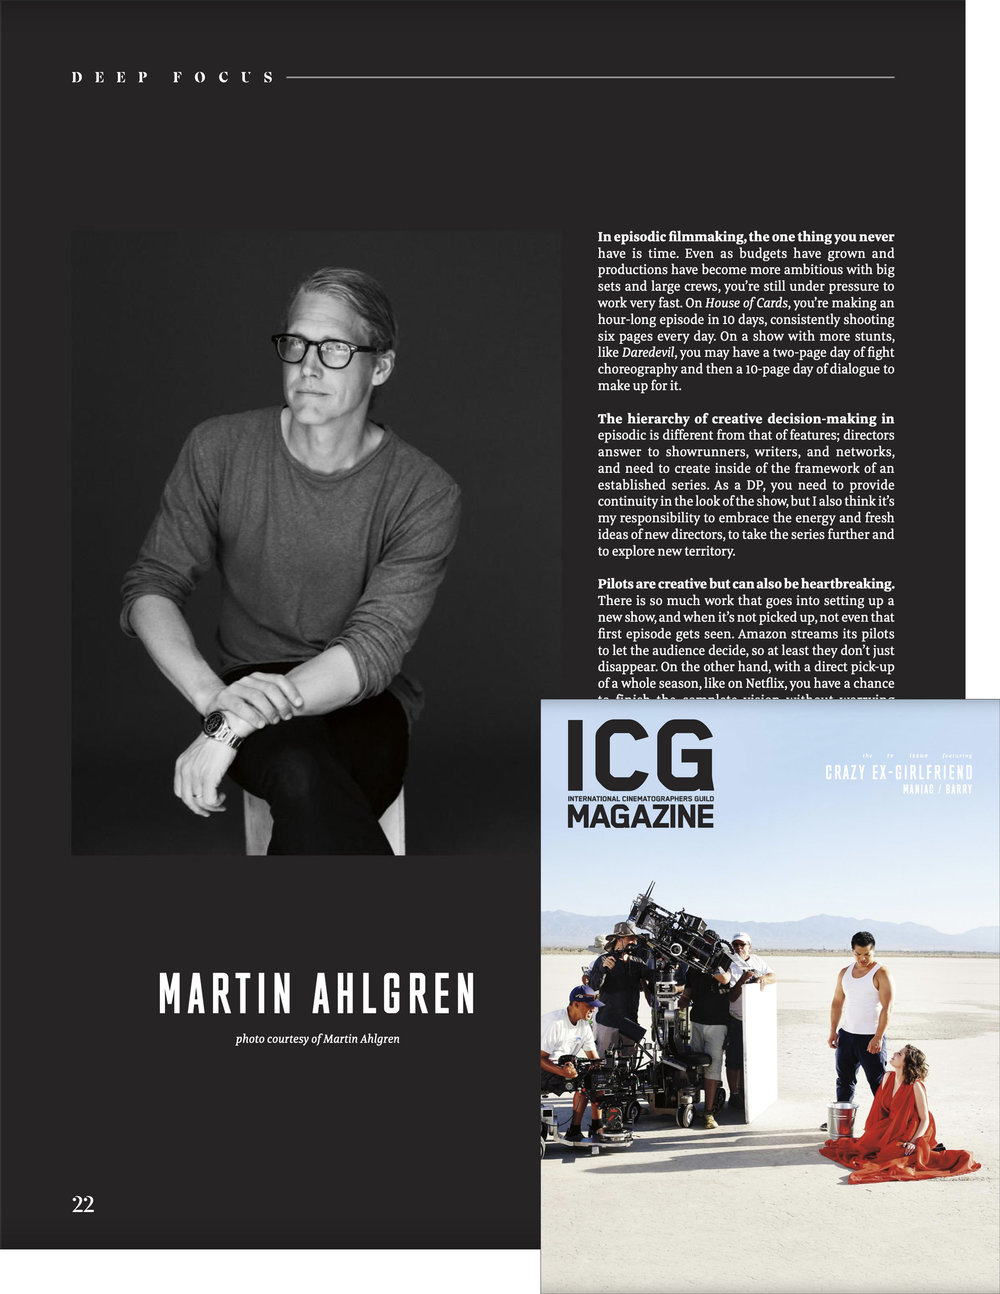 ICG Magazine - September 2018